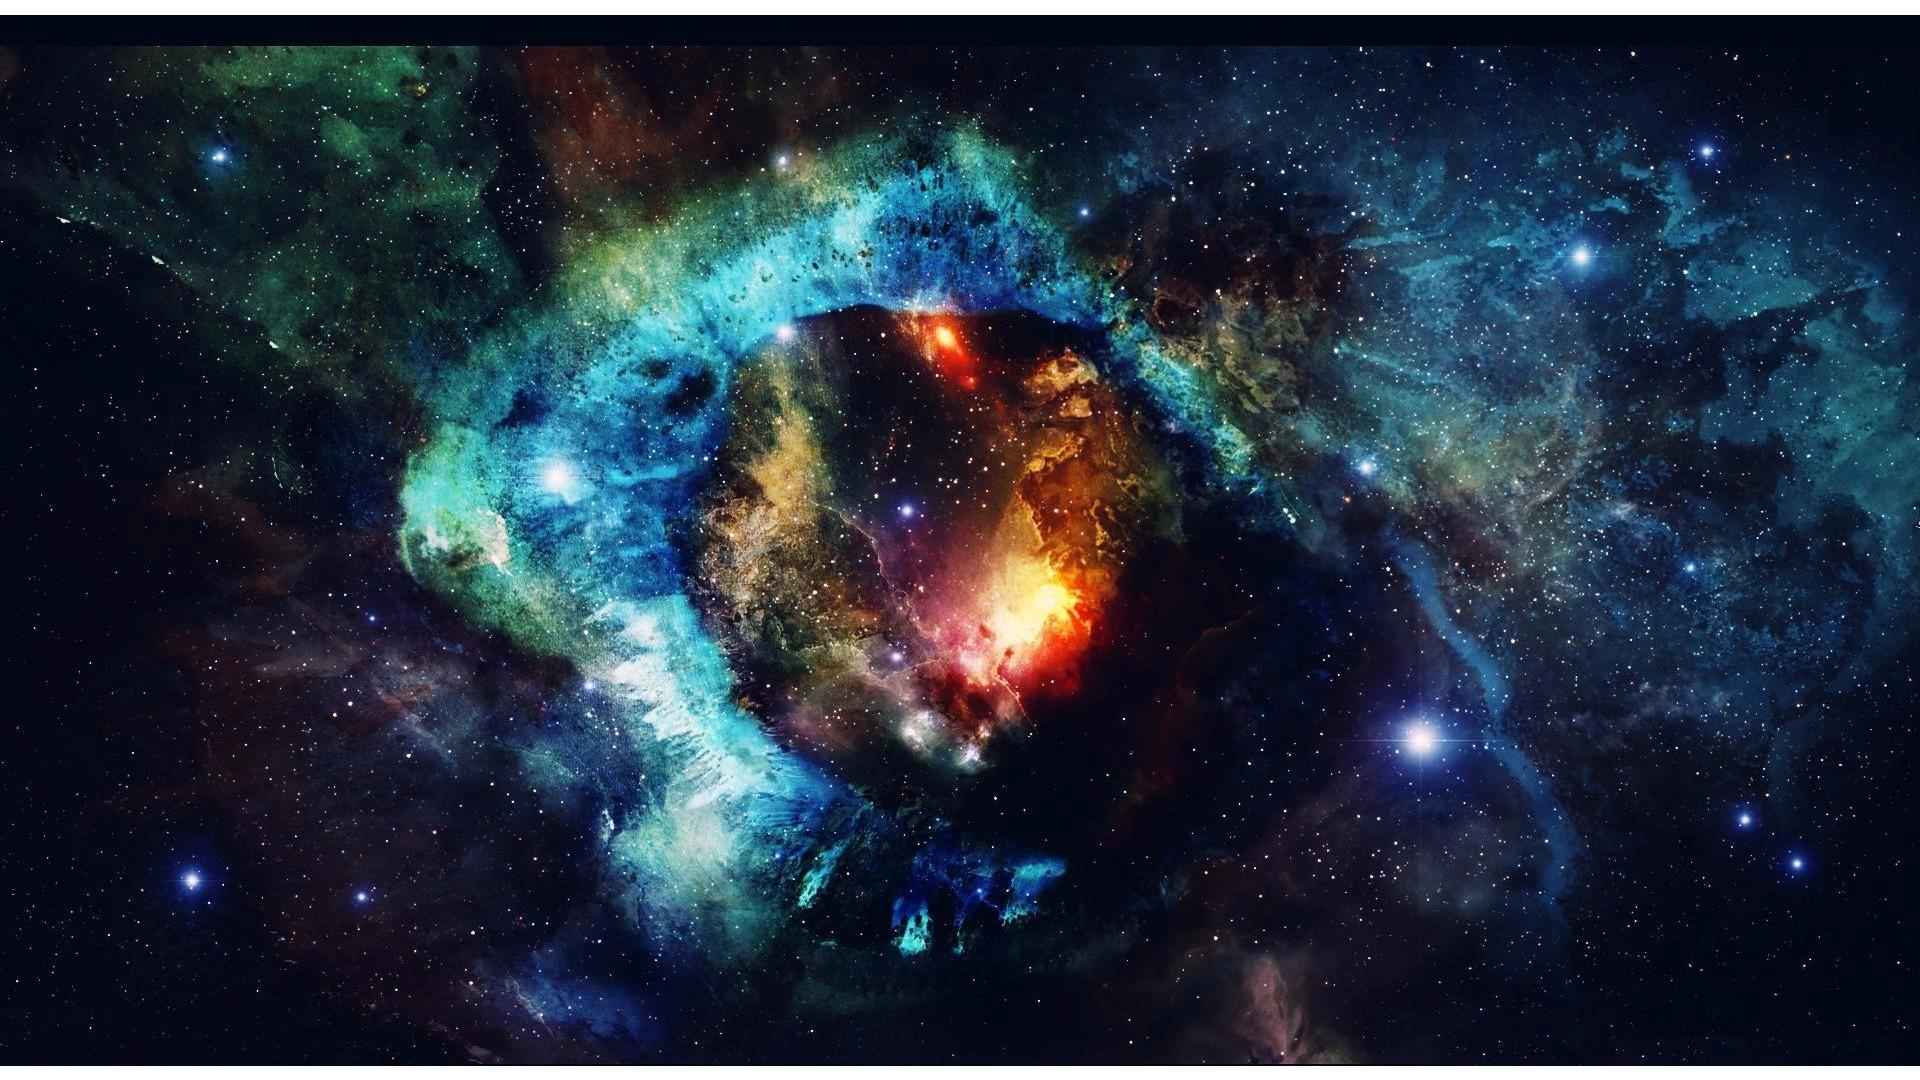 Universe Wallpaper 1920x1080 87 Images